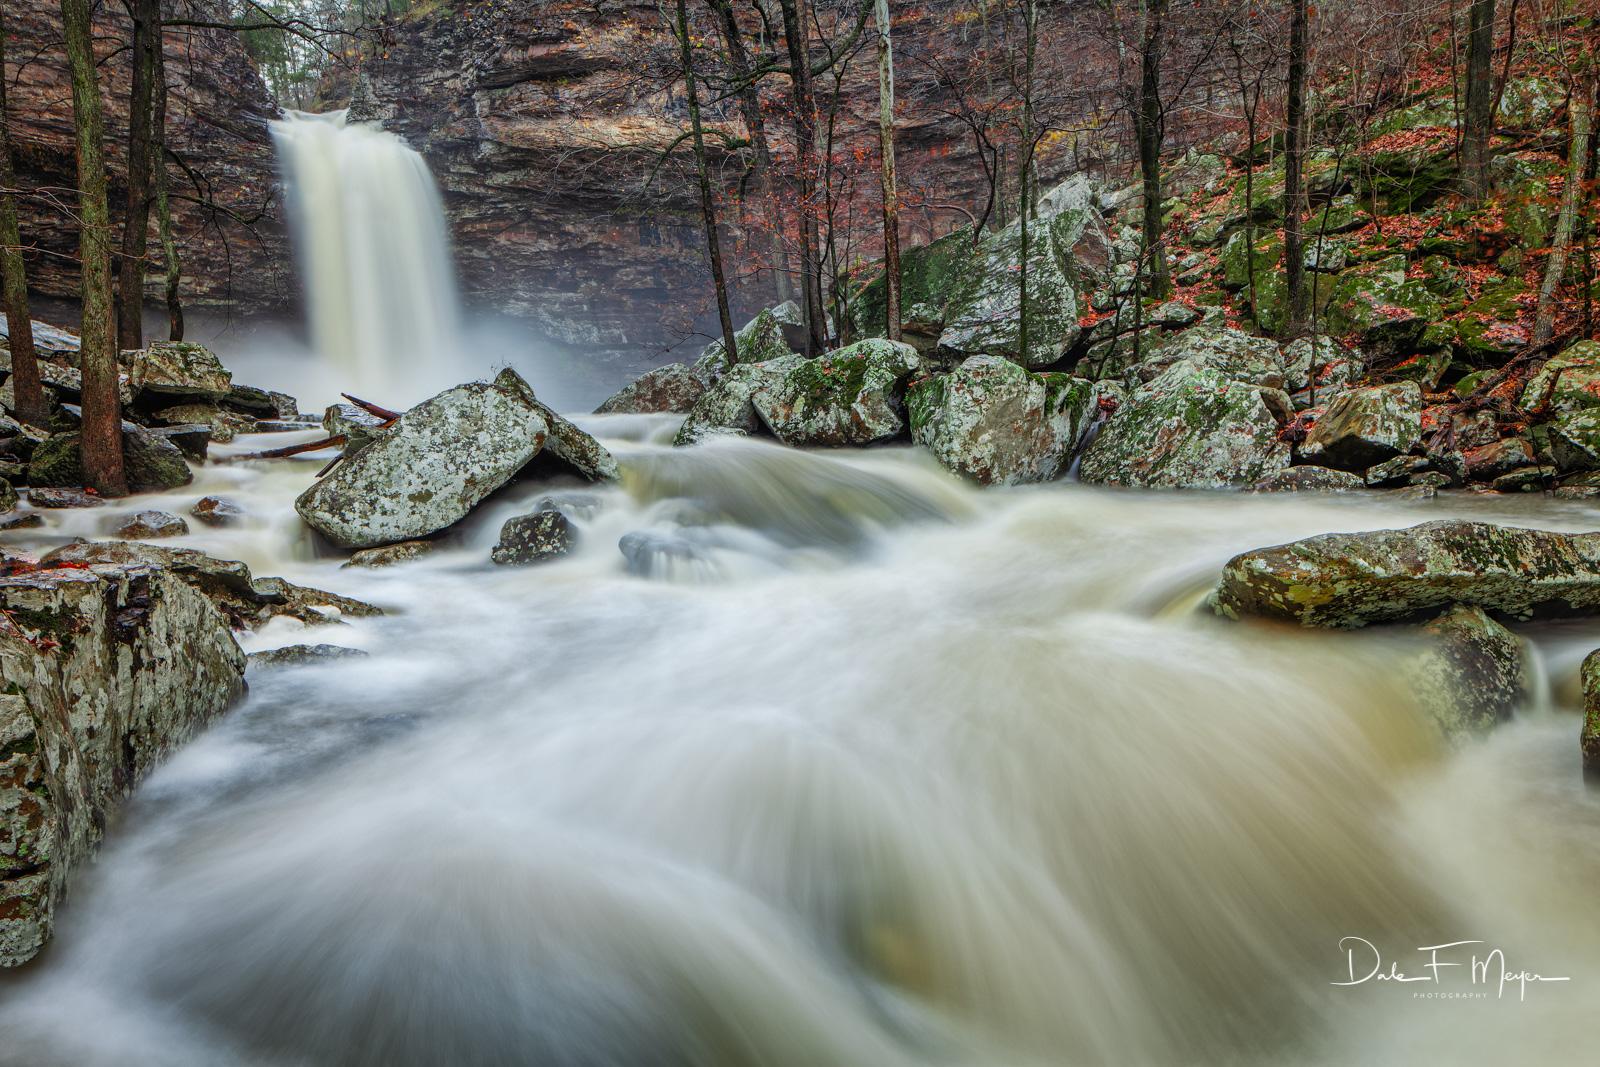 Cedar Creek,cedar falls,high water,late fall,petit jean,rivers streams and waterfalls gallery, rocks,water fall, photo